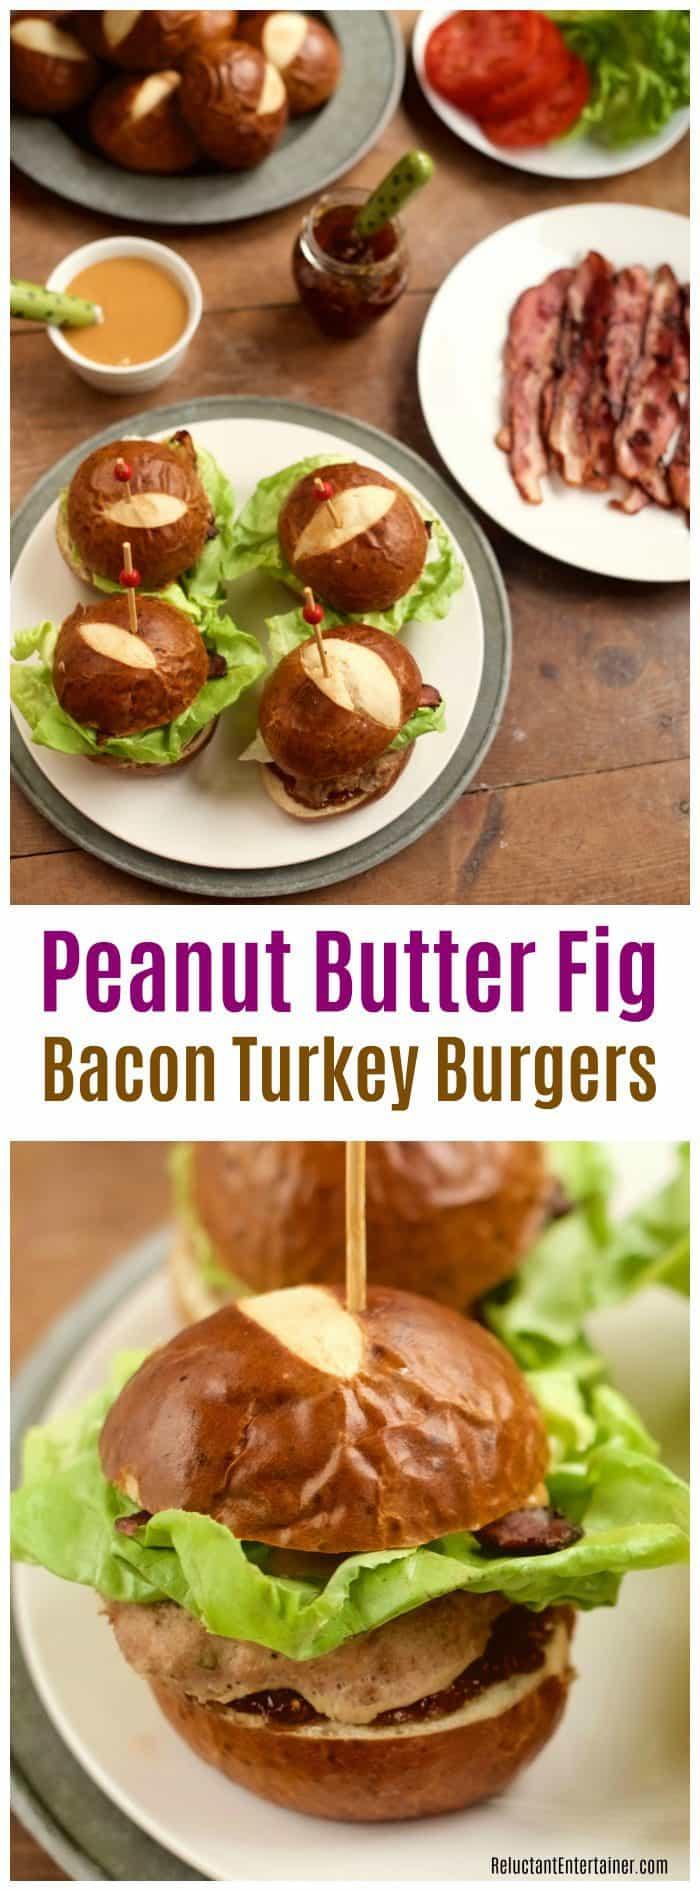 Peanut Butter Fig Bacon Turkey Burgers